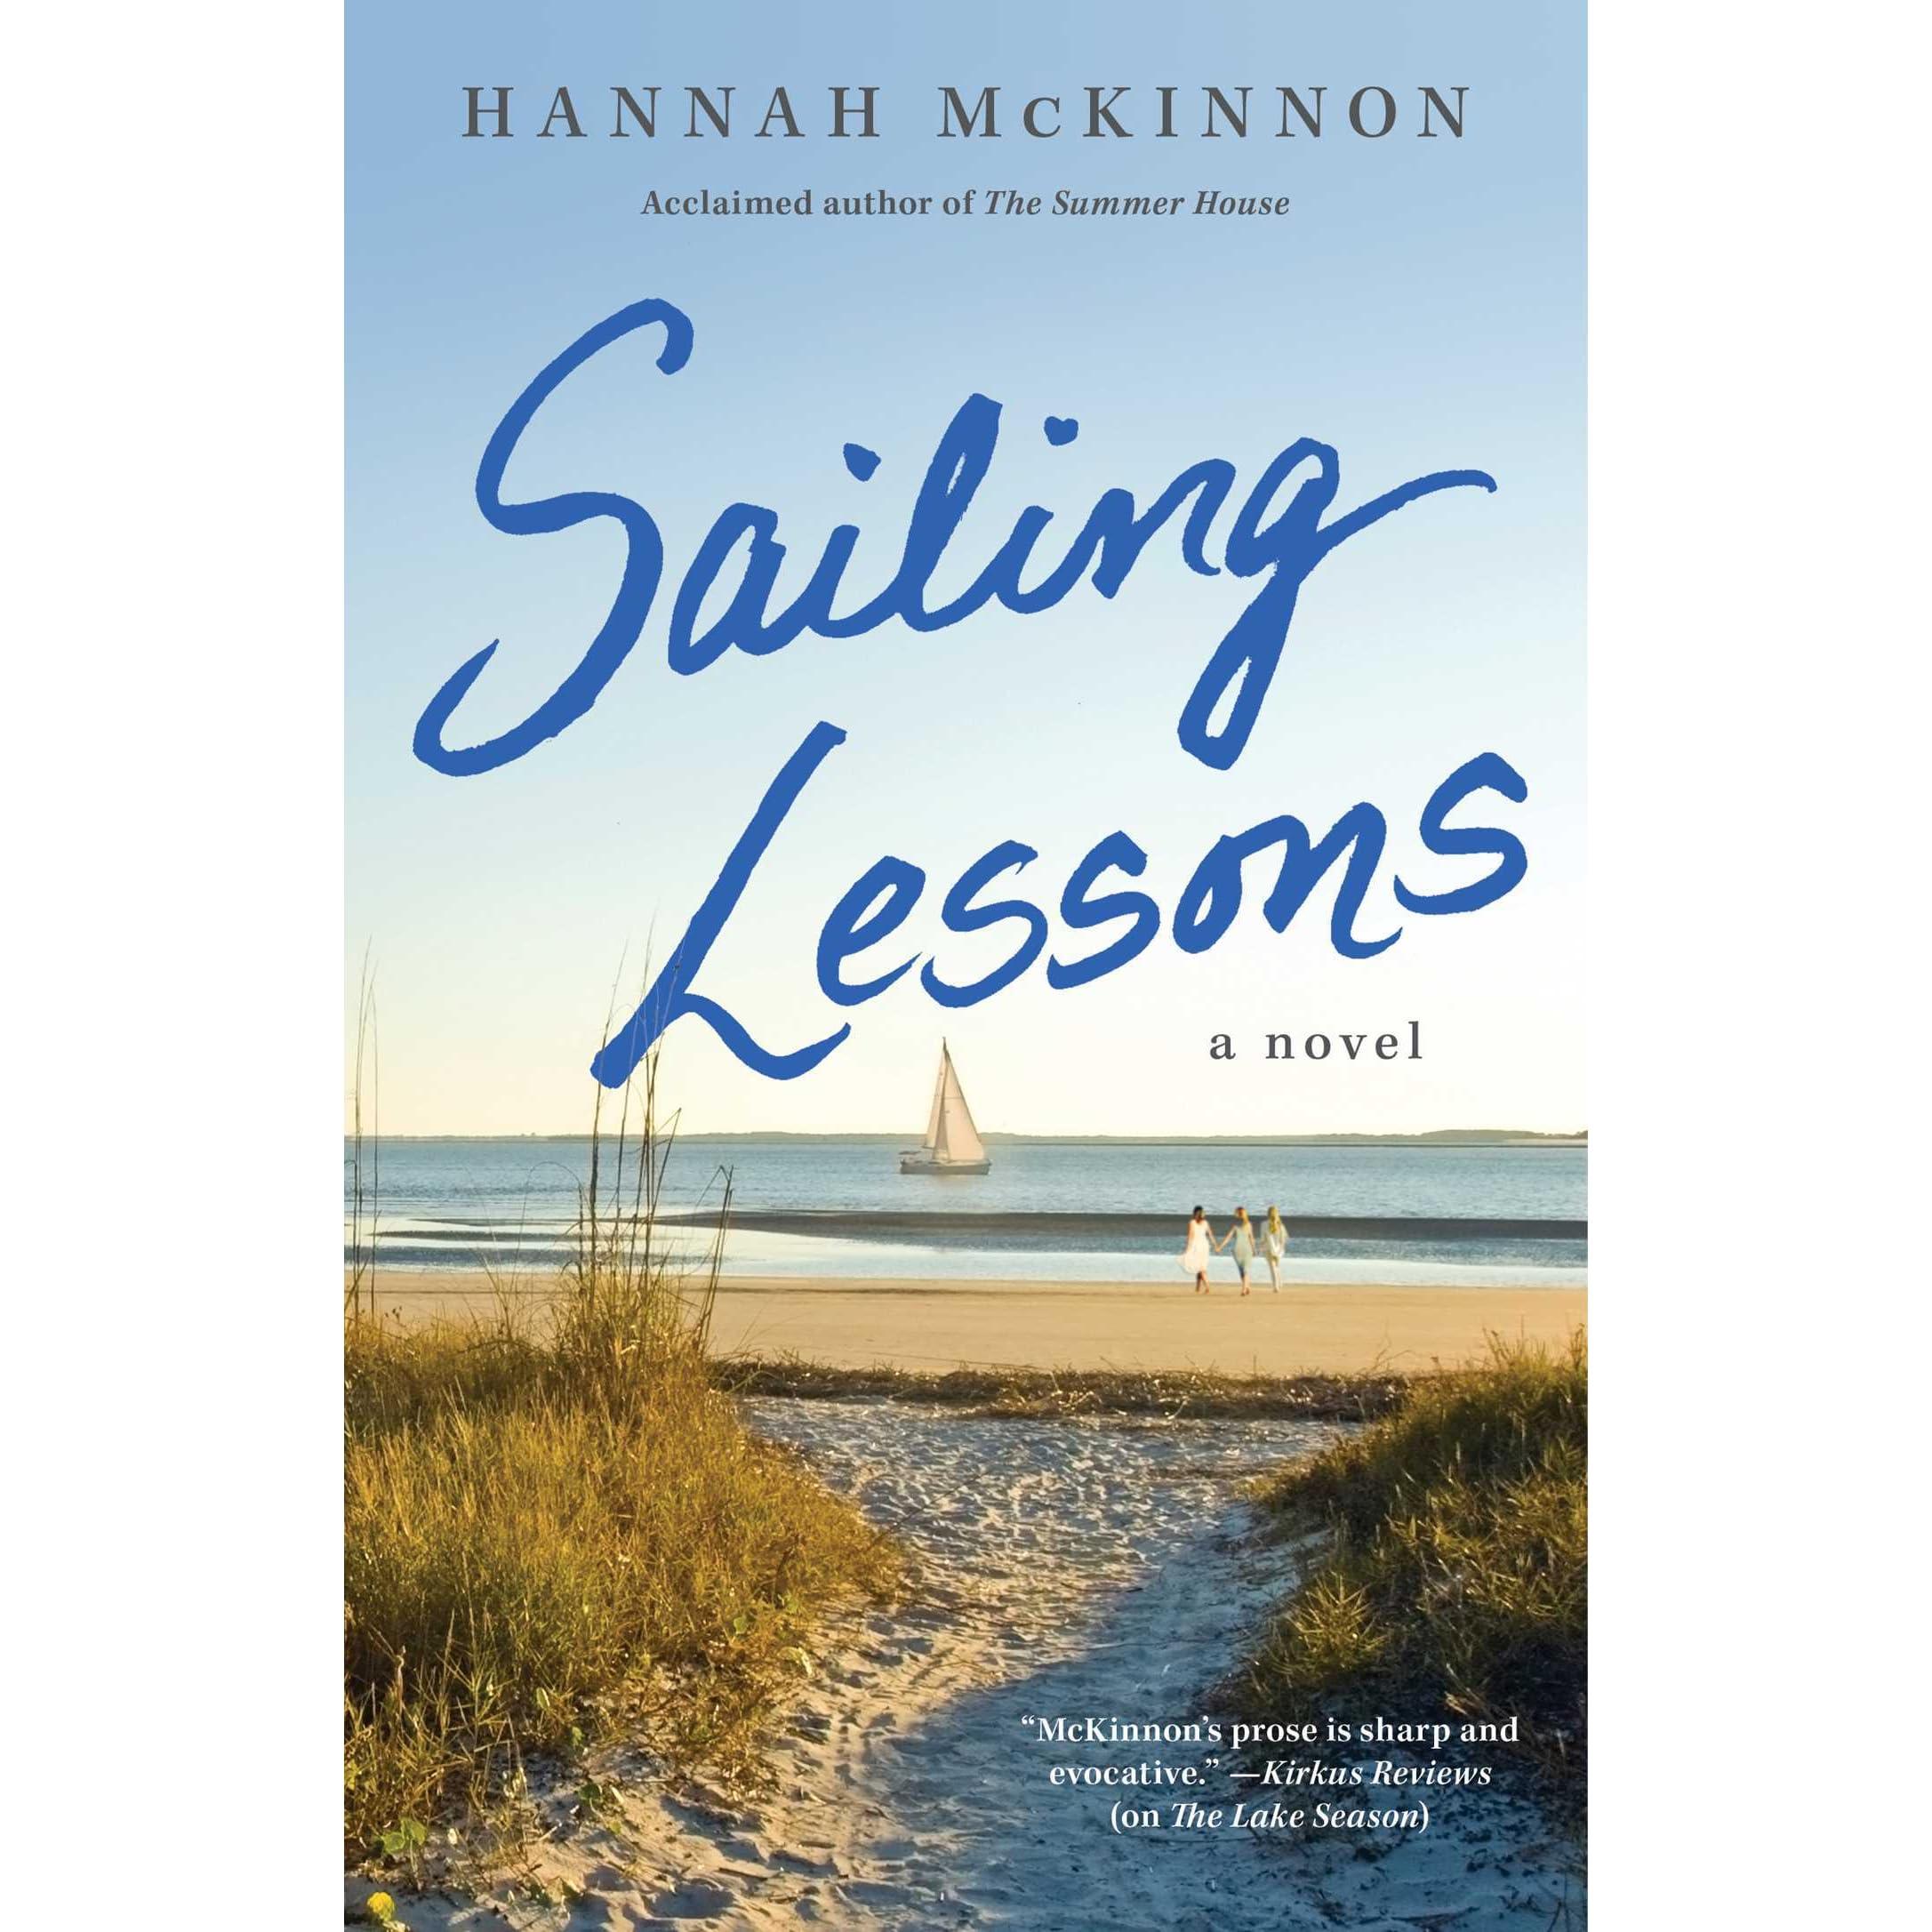 The Lake Season A Novel Wiring Library Titan Toro 5200 Diagram Sailing Lessons By Hannah Mckinnon